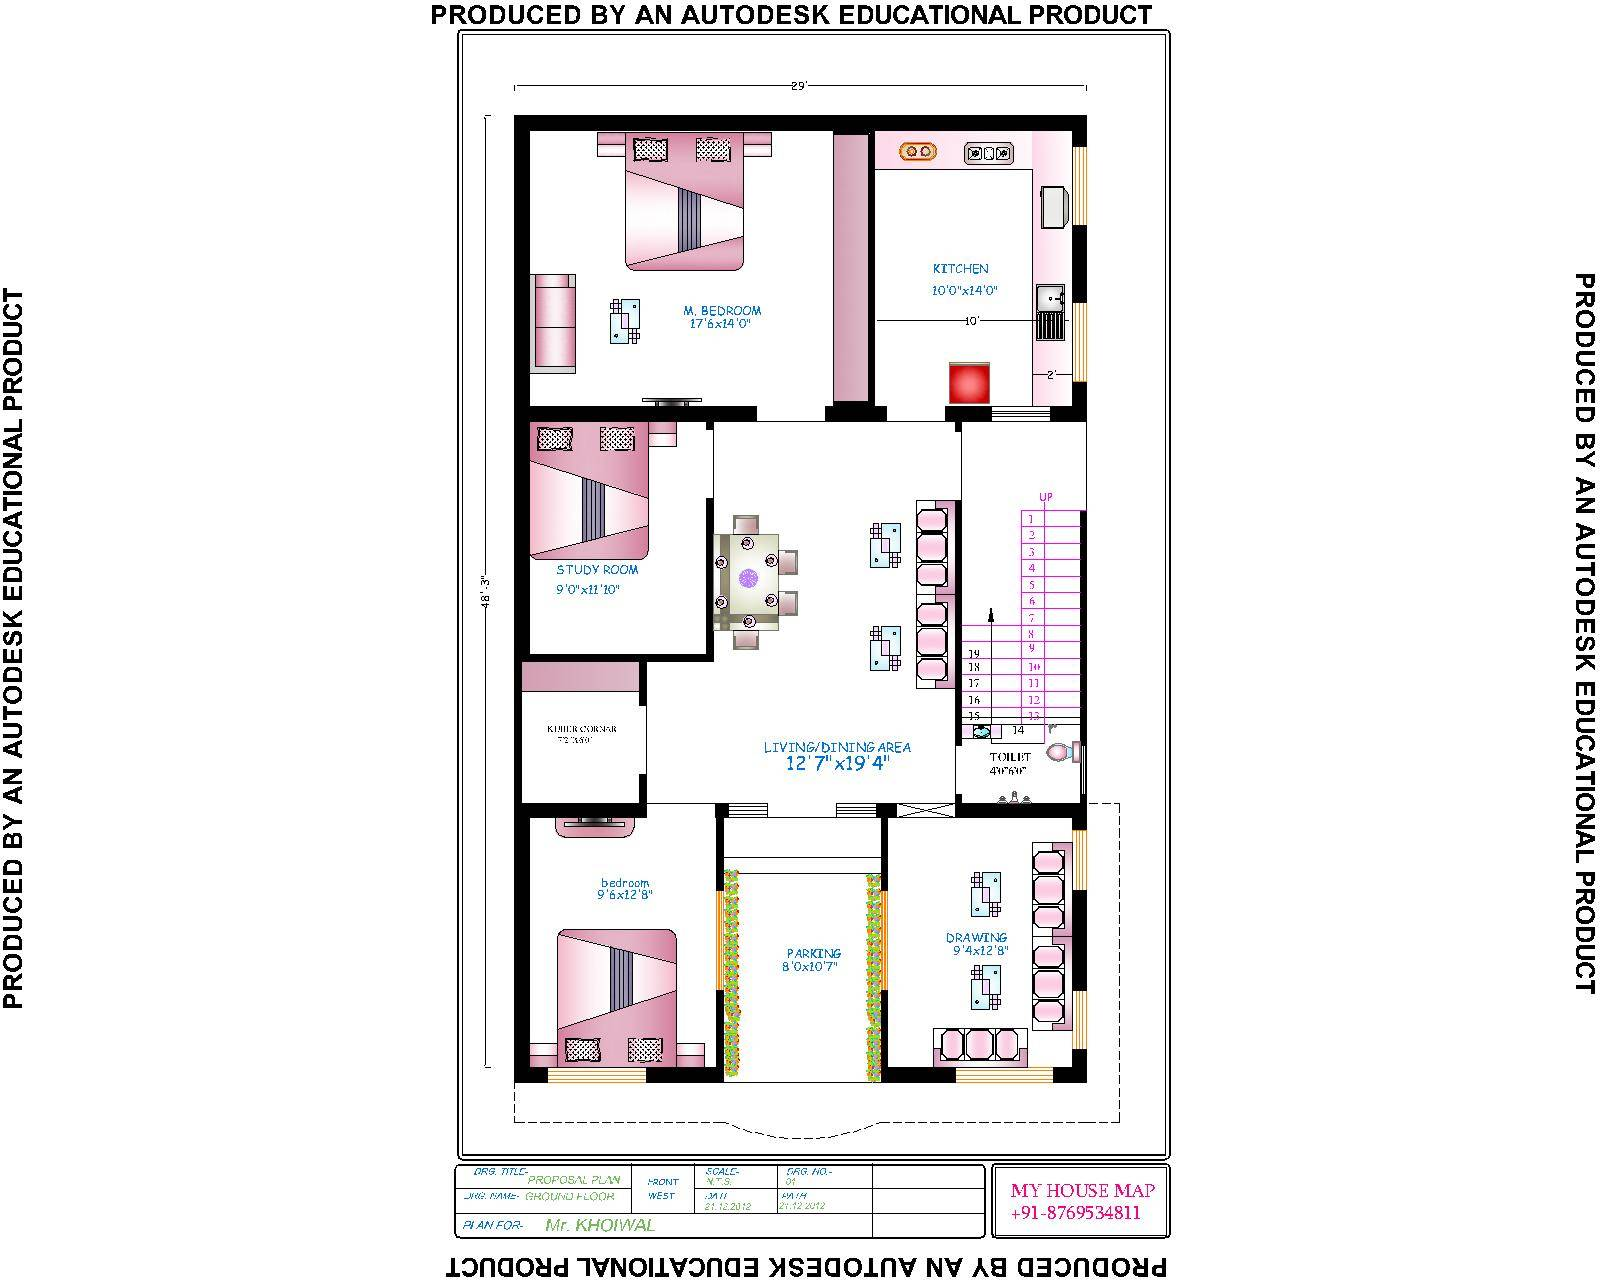 House maps designs samples - House design